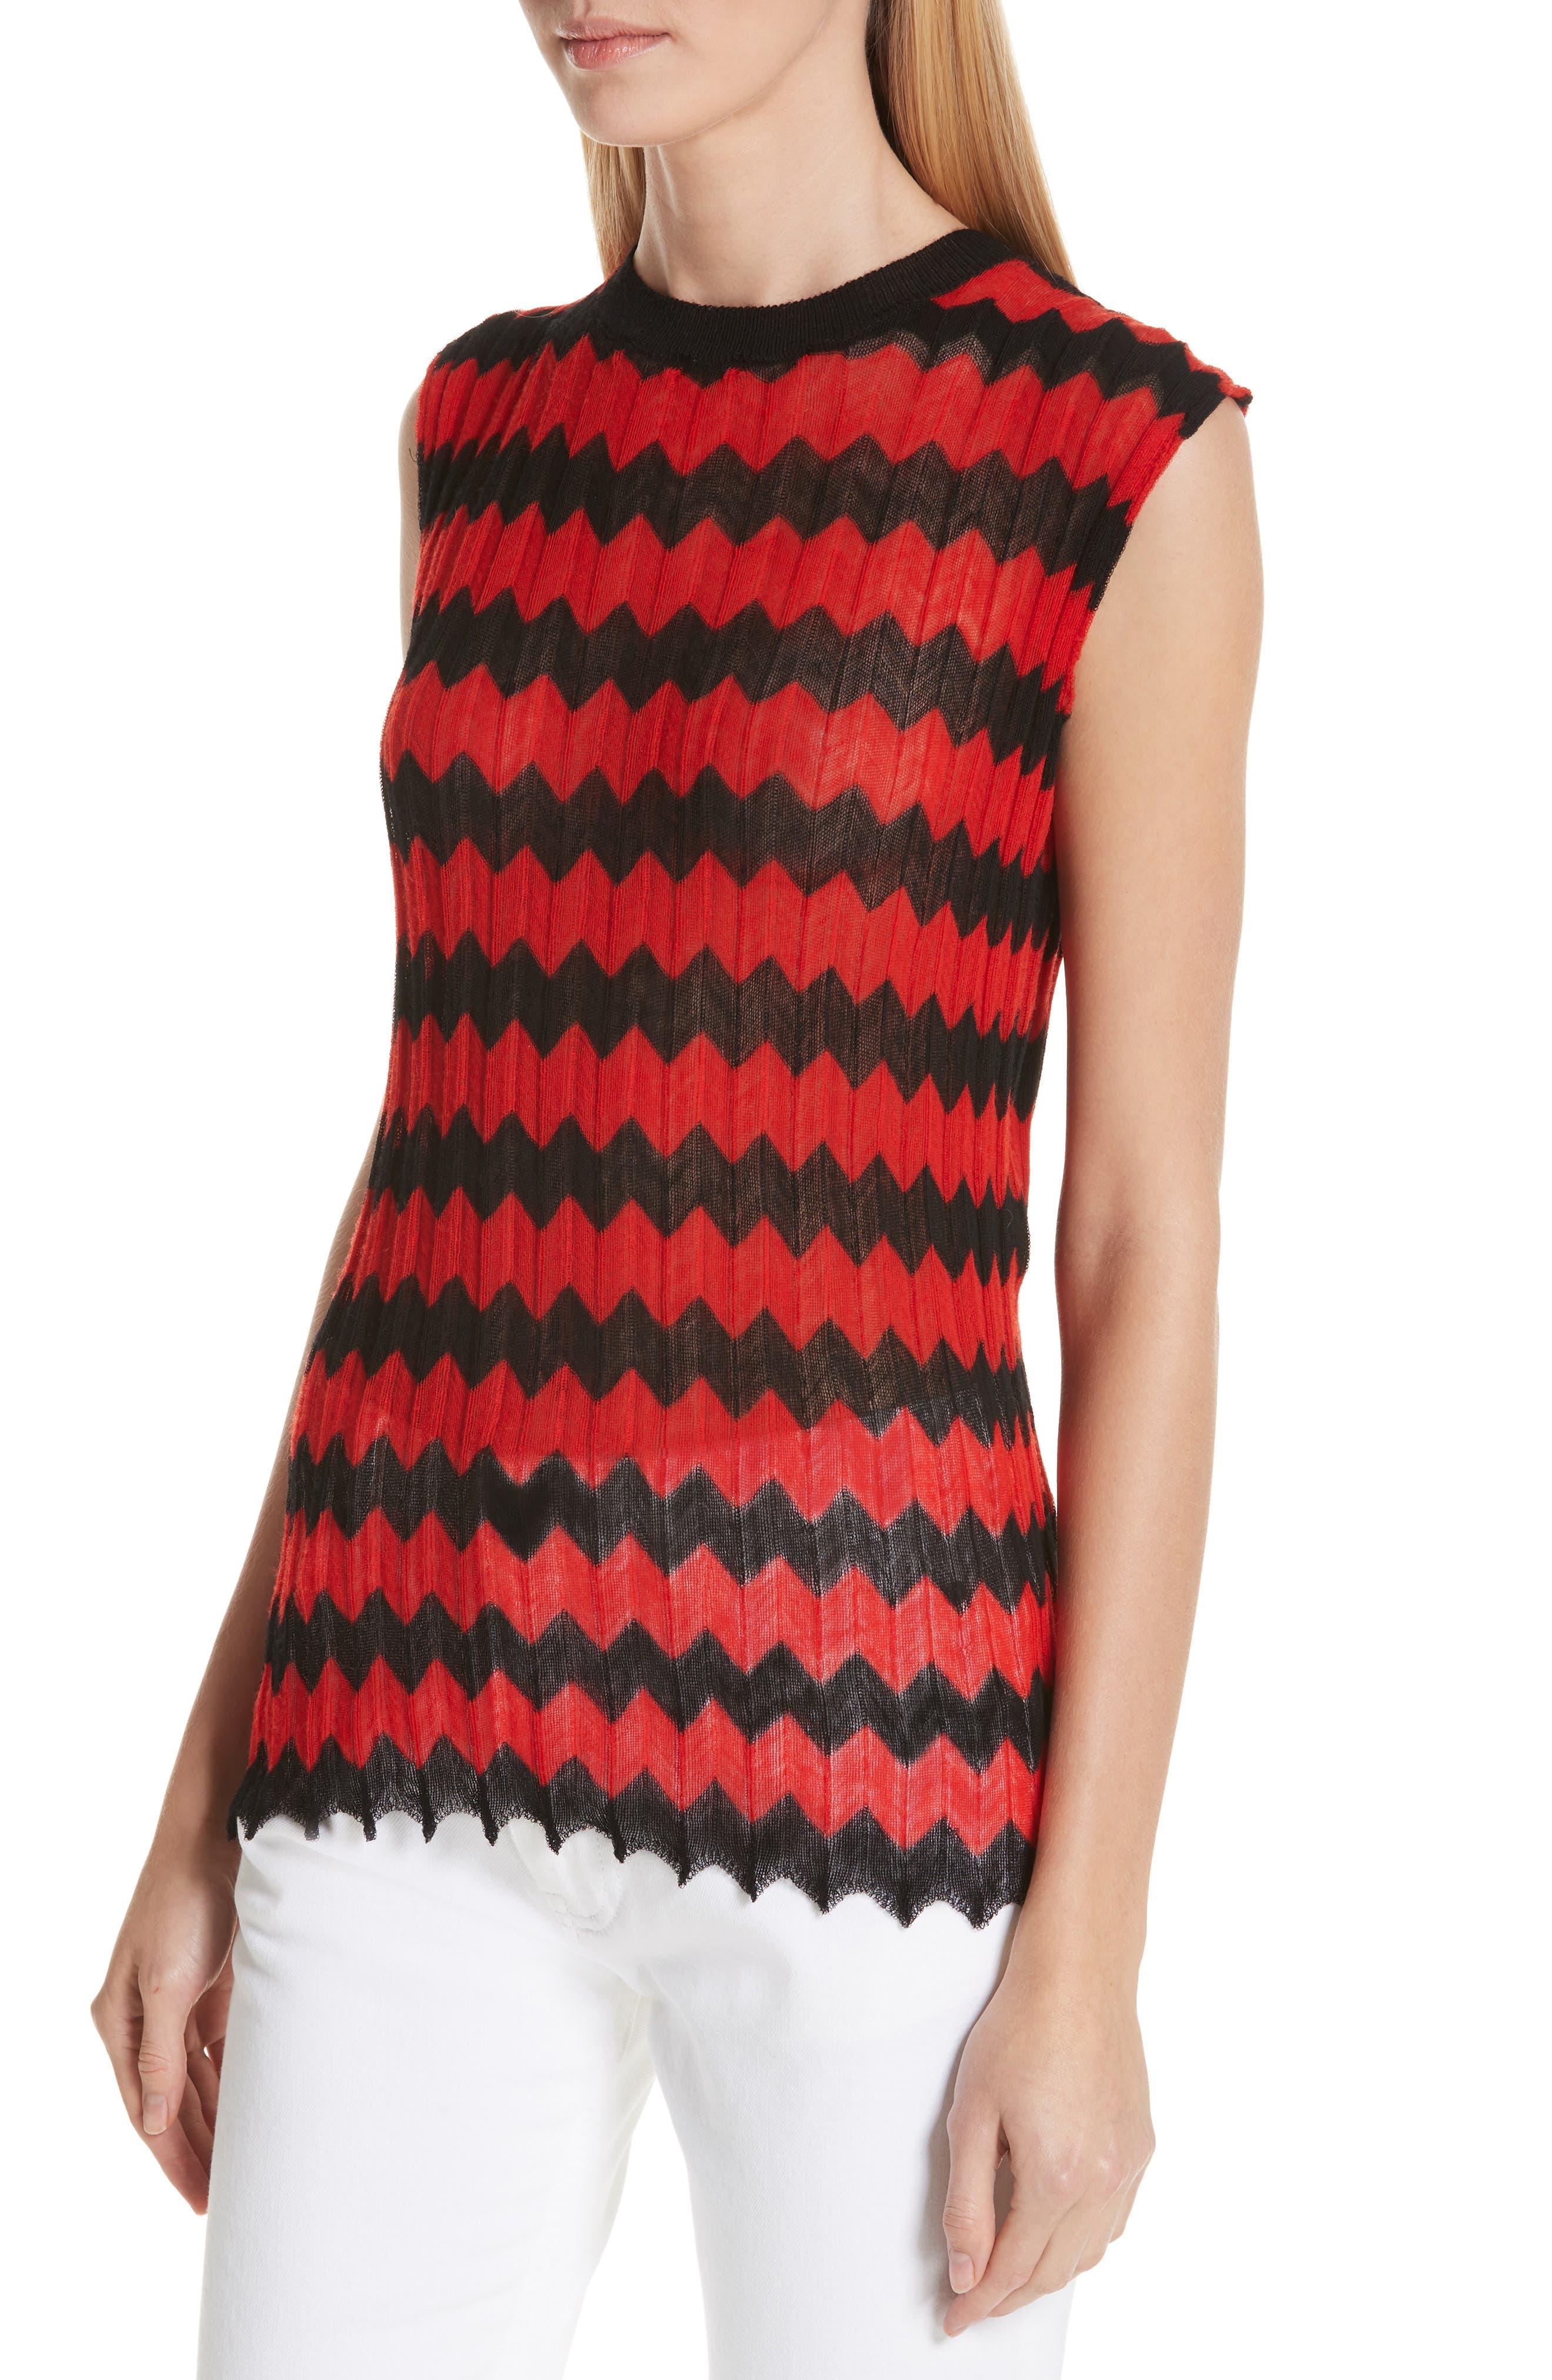 CALVIN KLEIN 205W39NYC, Chevron Stripe Wool Tank Top, Alternate thumbnail 4, color, RED BLACK